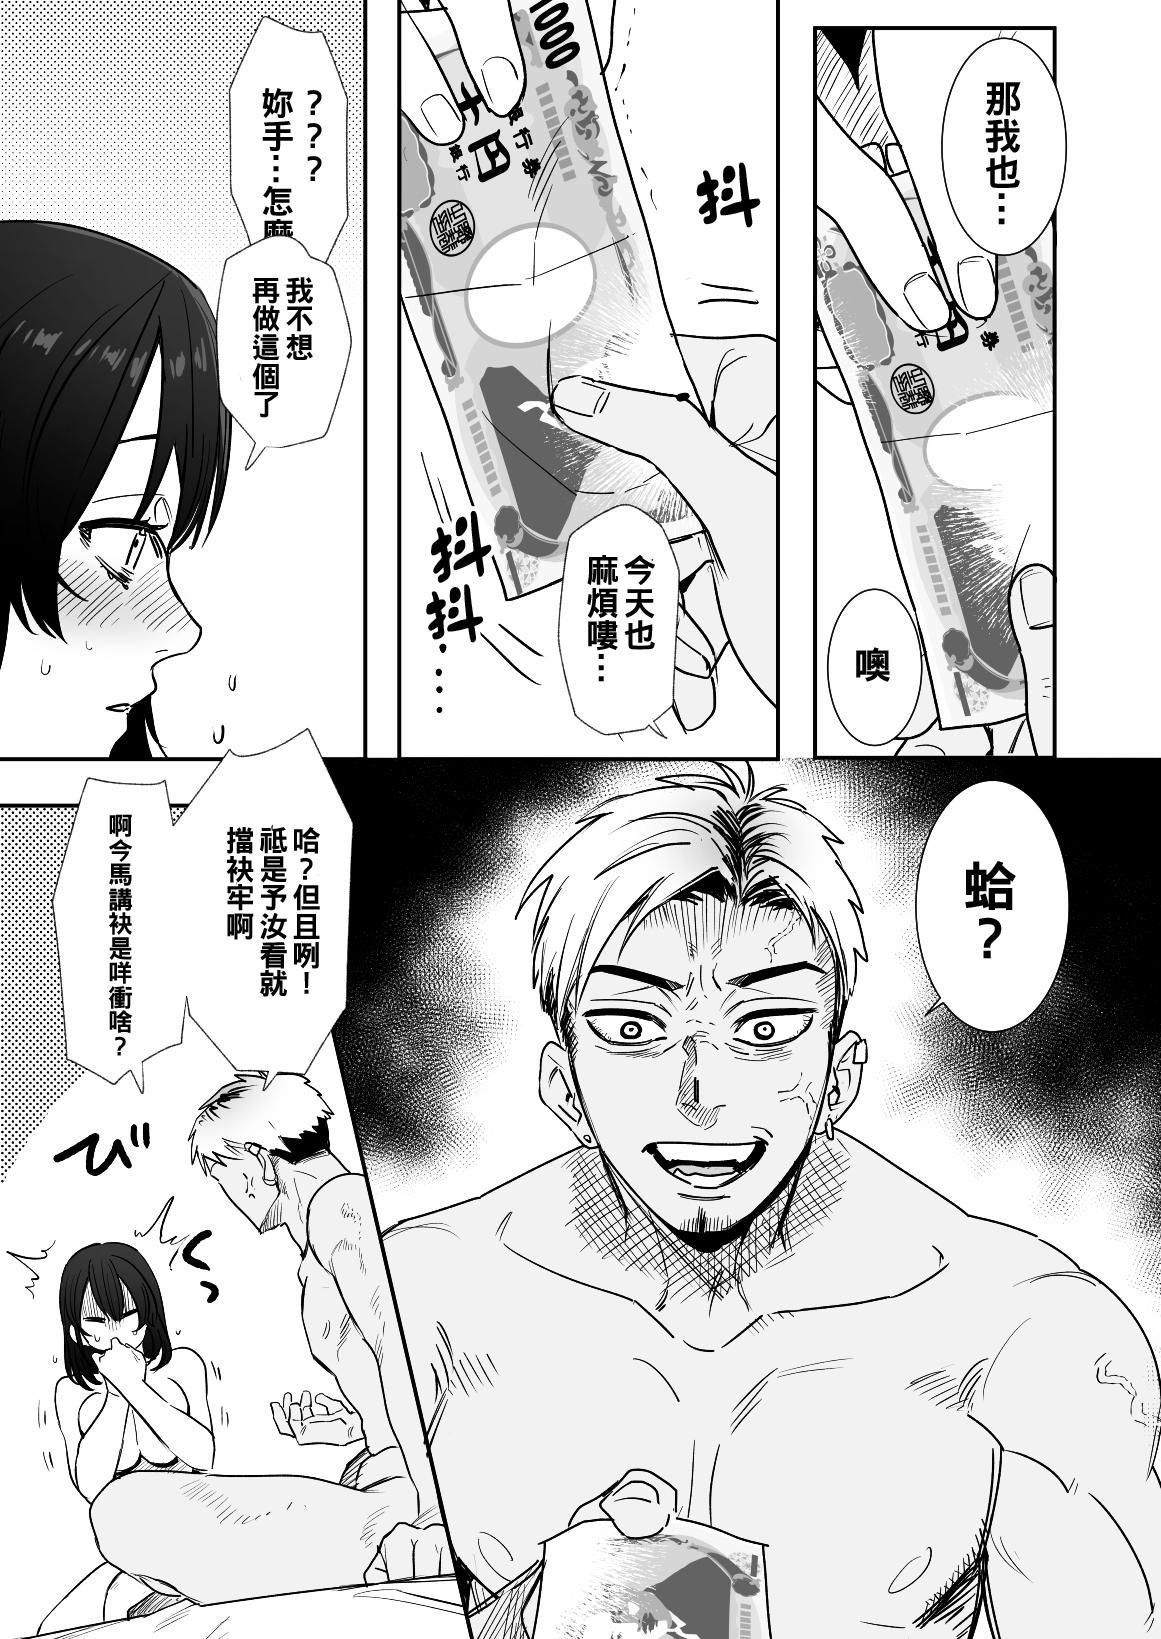 〇sen Yen de Oppai Misete. 6